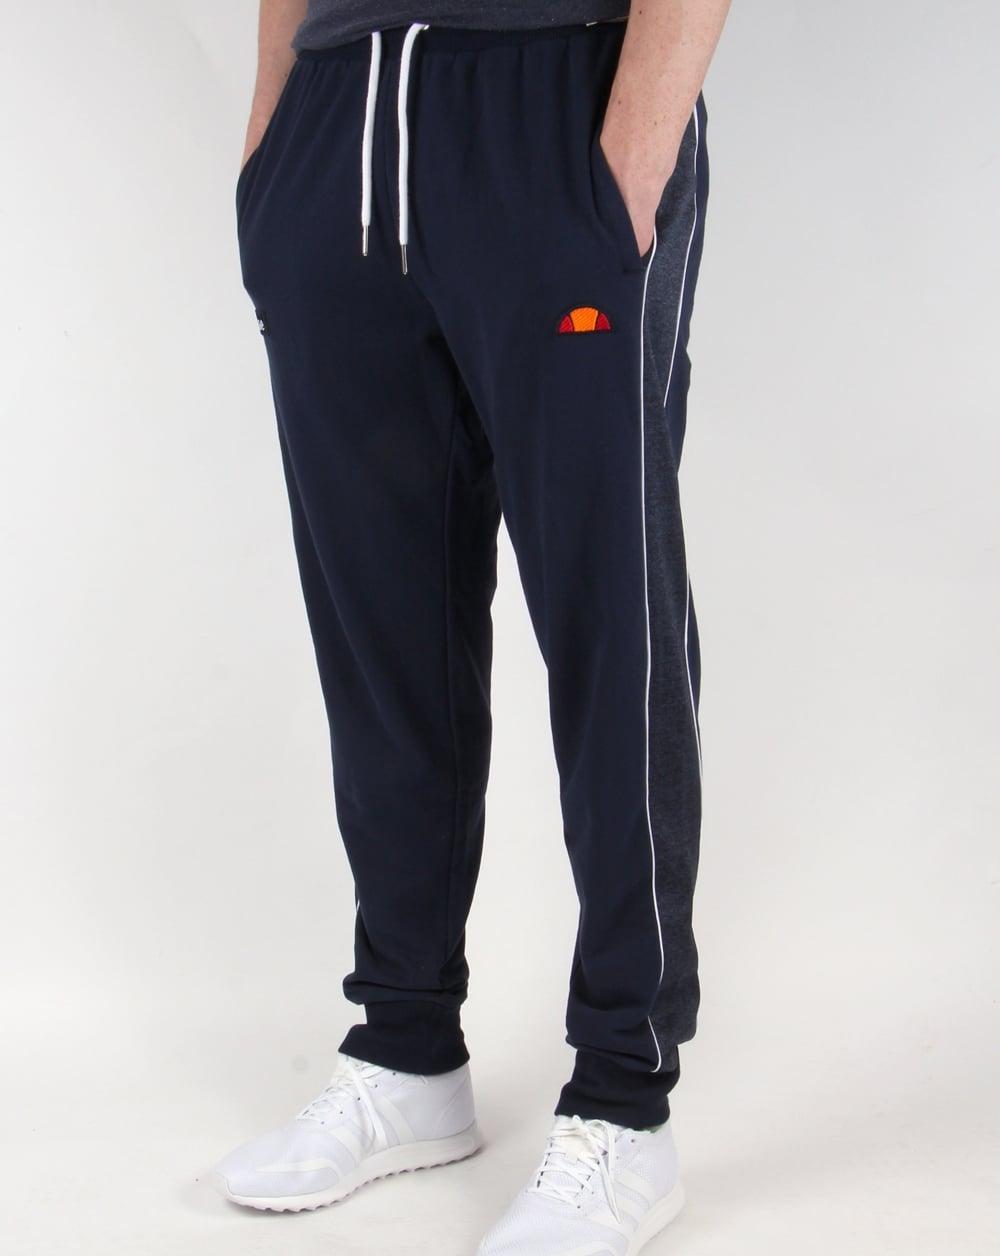 1c0c7a8d Ellesse Borini Track Pants Navy